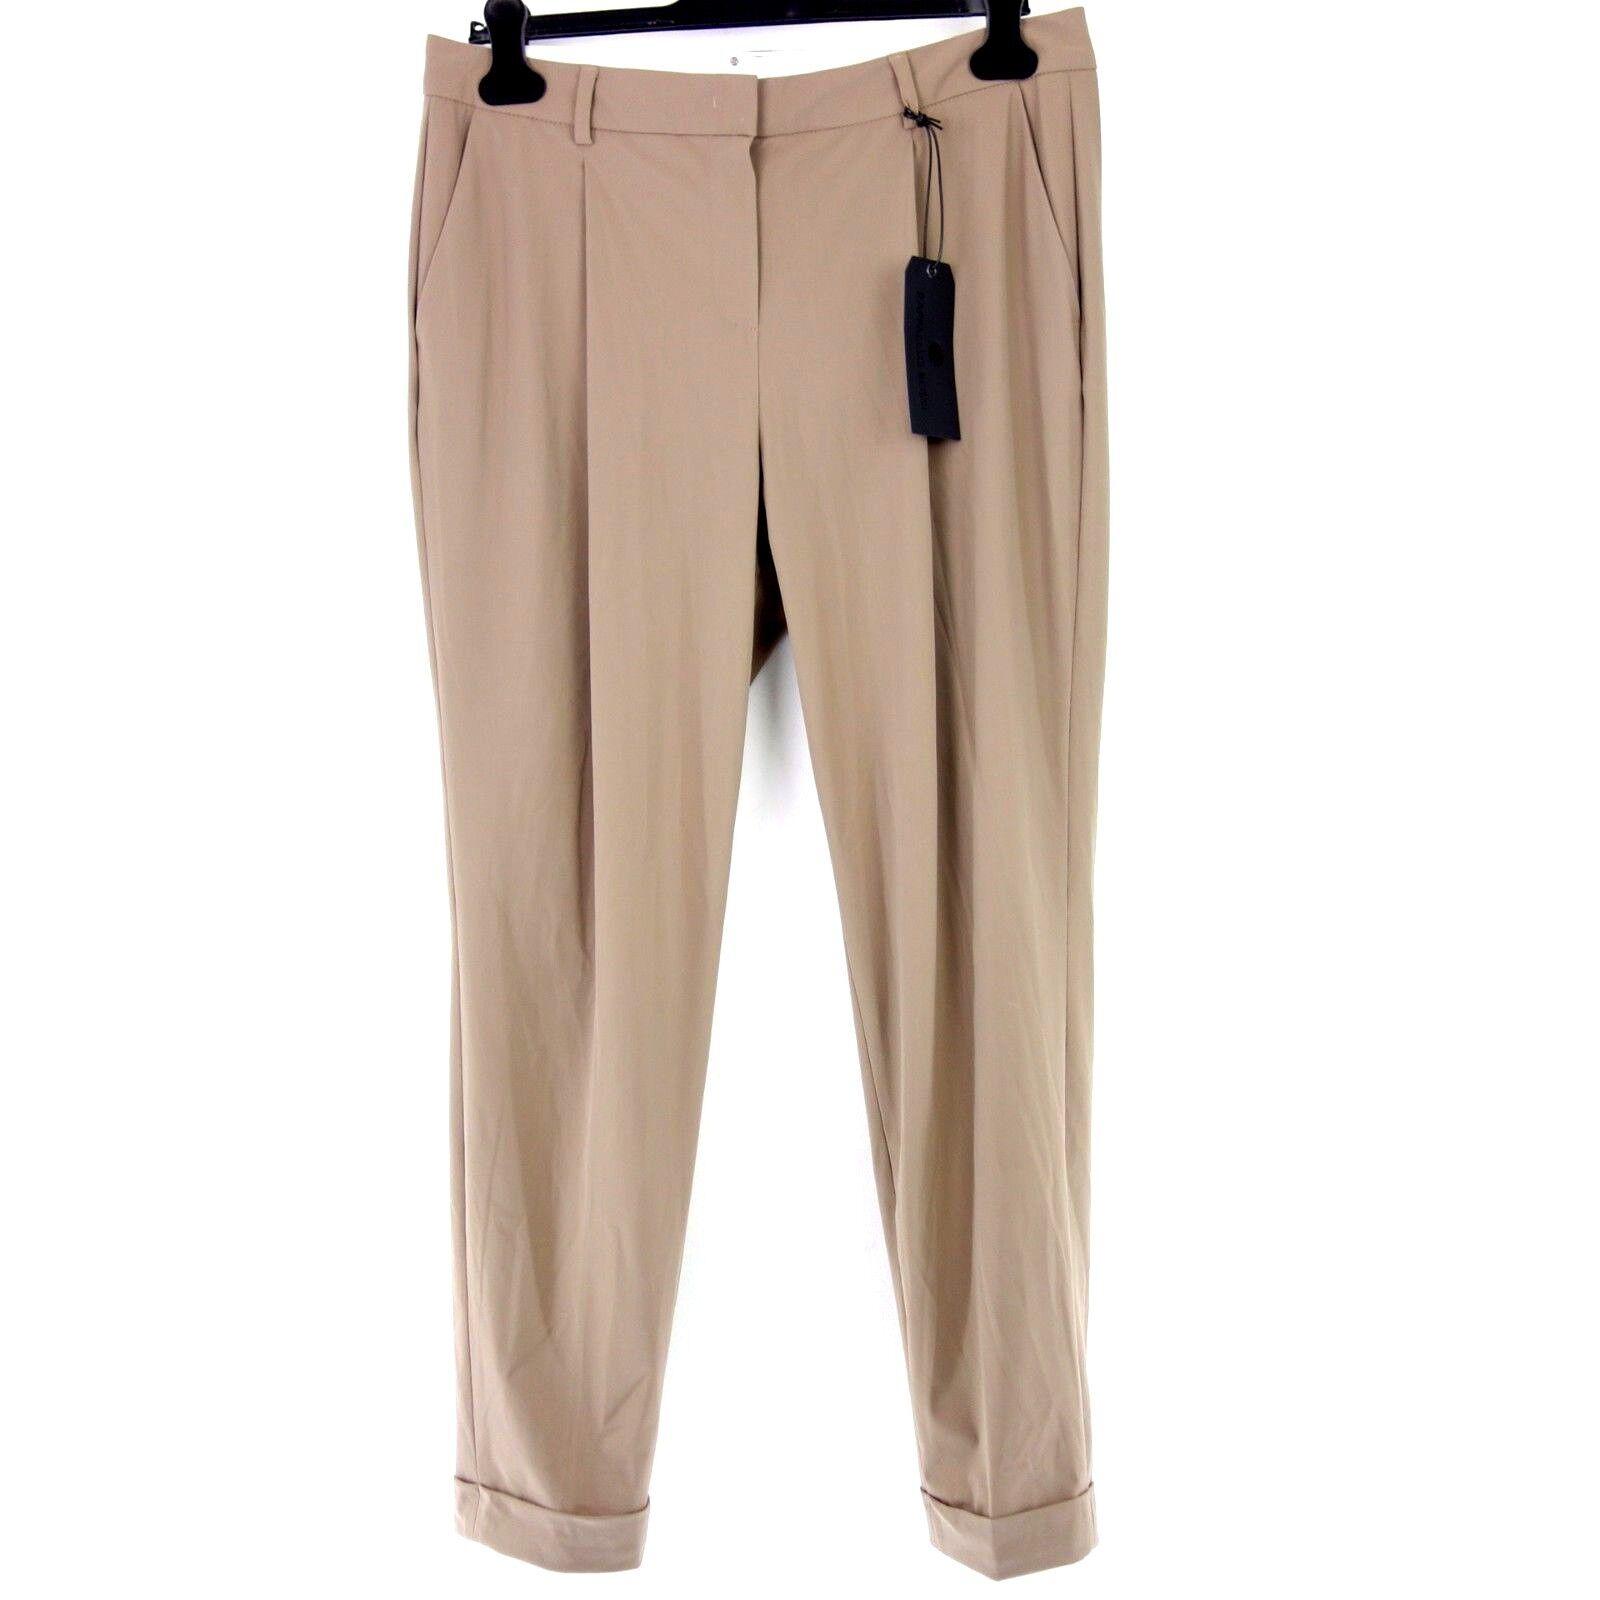 Raffaello Rossi by Schera Women Pants Bena 40 Brown Cloth Trousers Relaxed